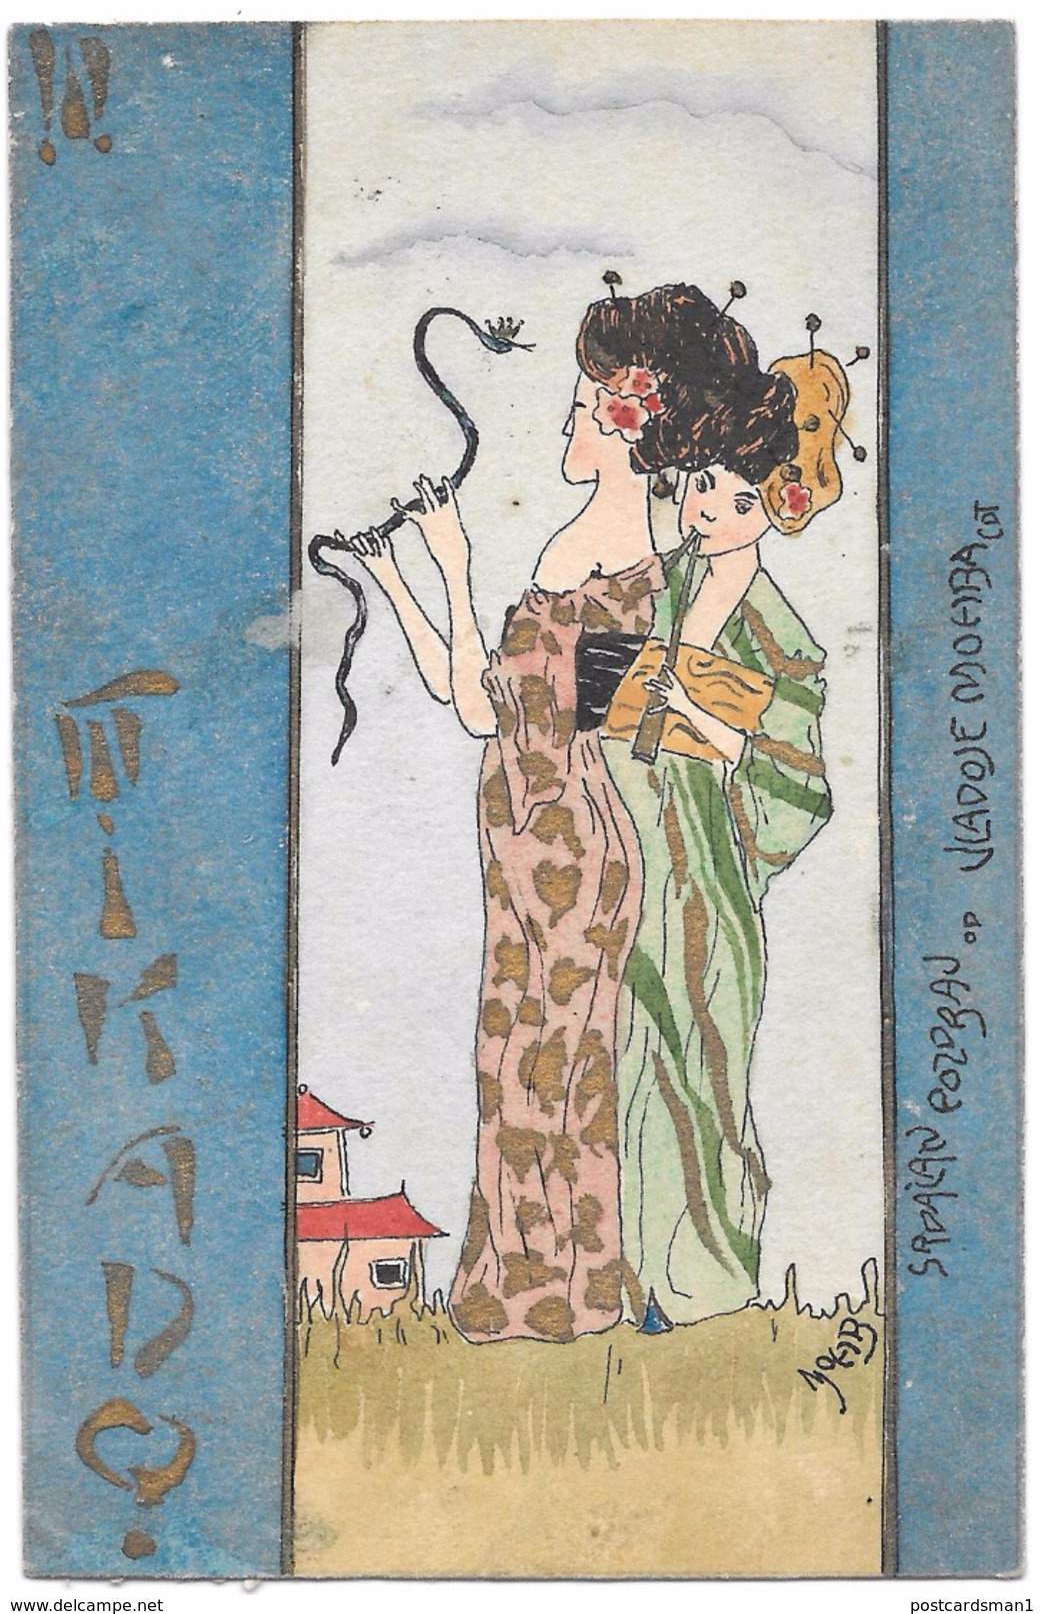 Art Nouveau RAPHAEL KIRCHNER? -  BOZZETTO DIPINTO A MANO ! - SAGGIO - Serie Mikado   - (unica Al Mondo) - Kirchner, Raphael